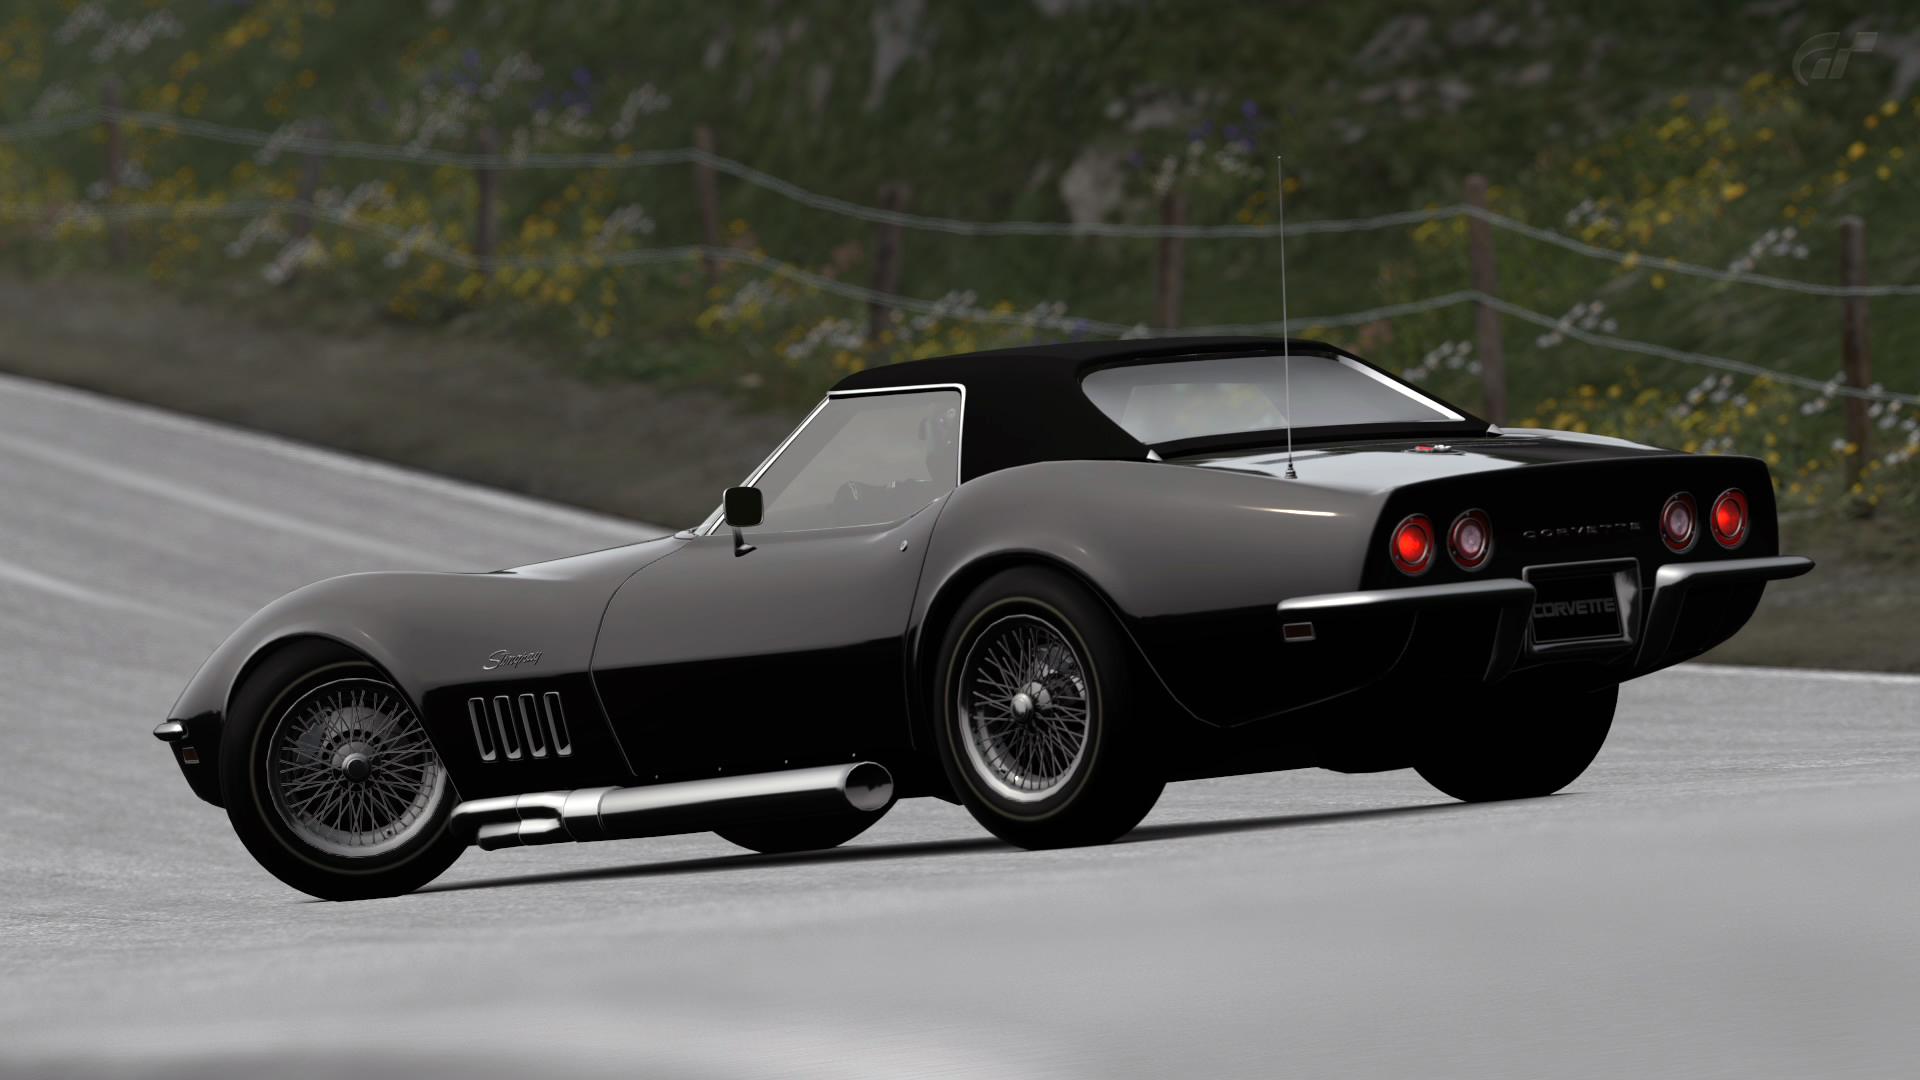 1969 corvette wallpaper wallpapersafari - Corvette Stingray 1969 Wallpaper